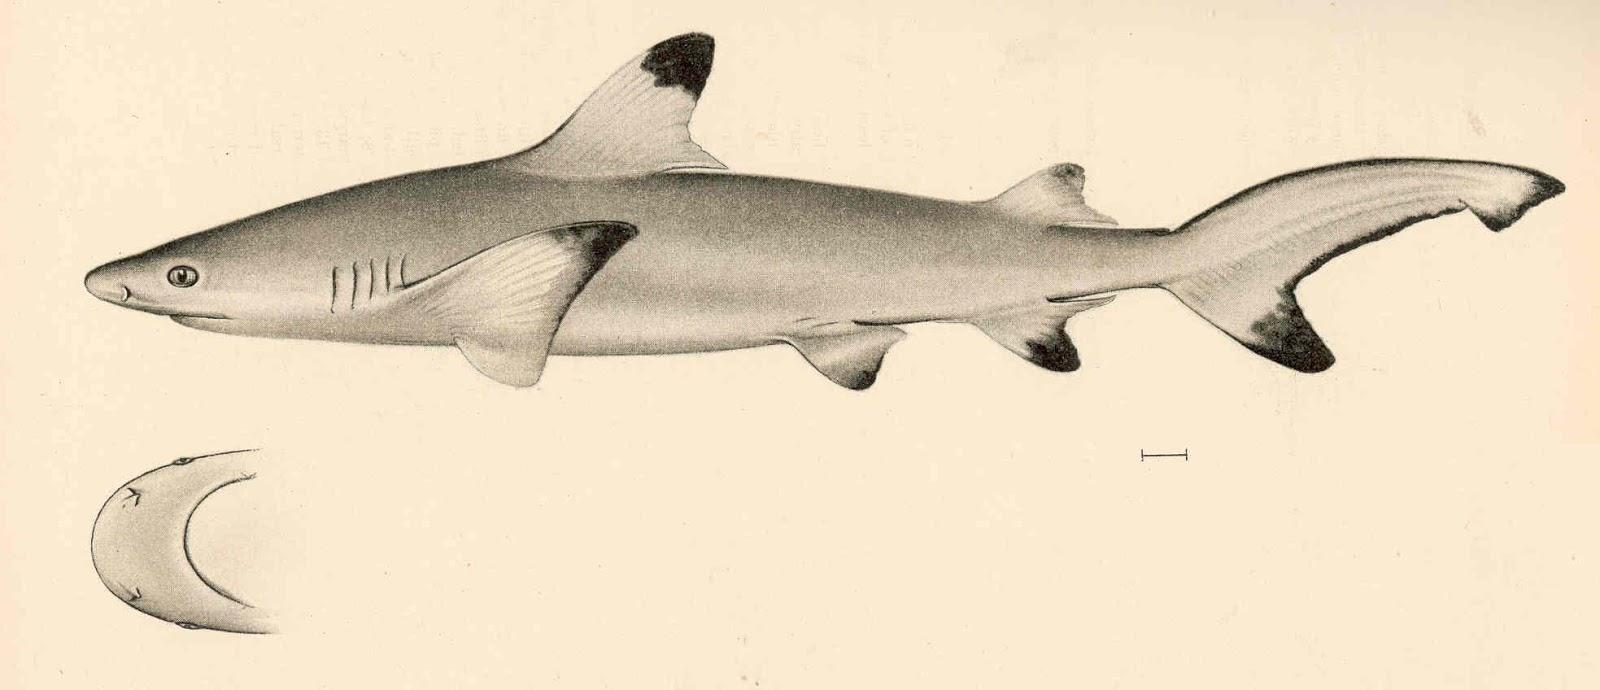 Unduh 60 Gambar Ikan Cucut Terpopuler